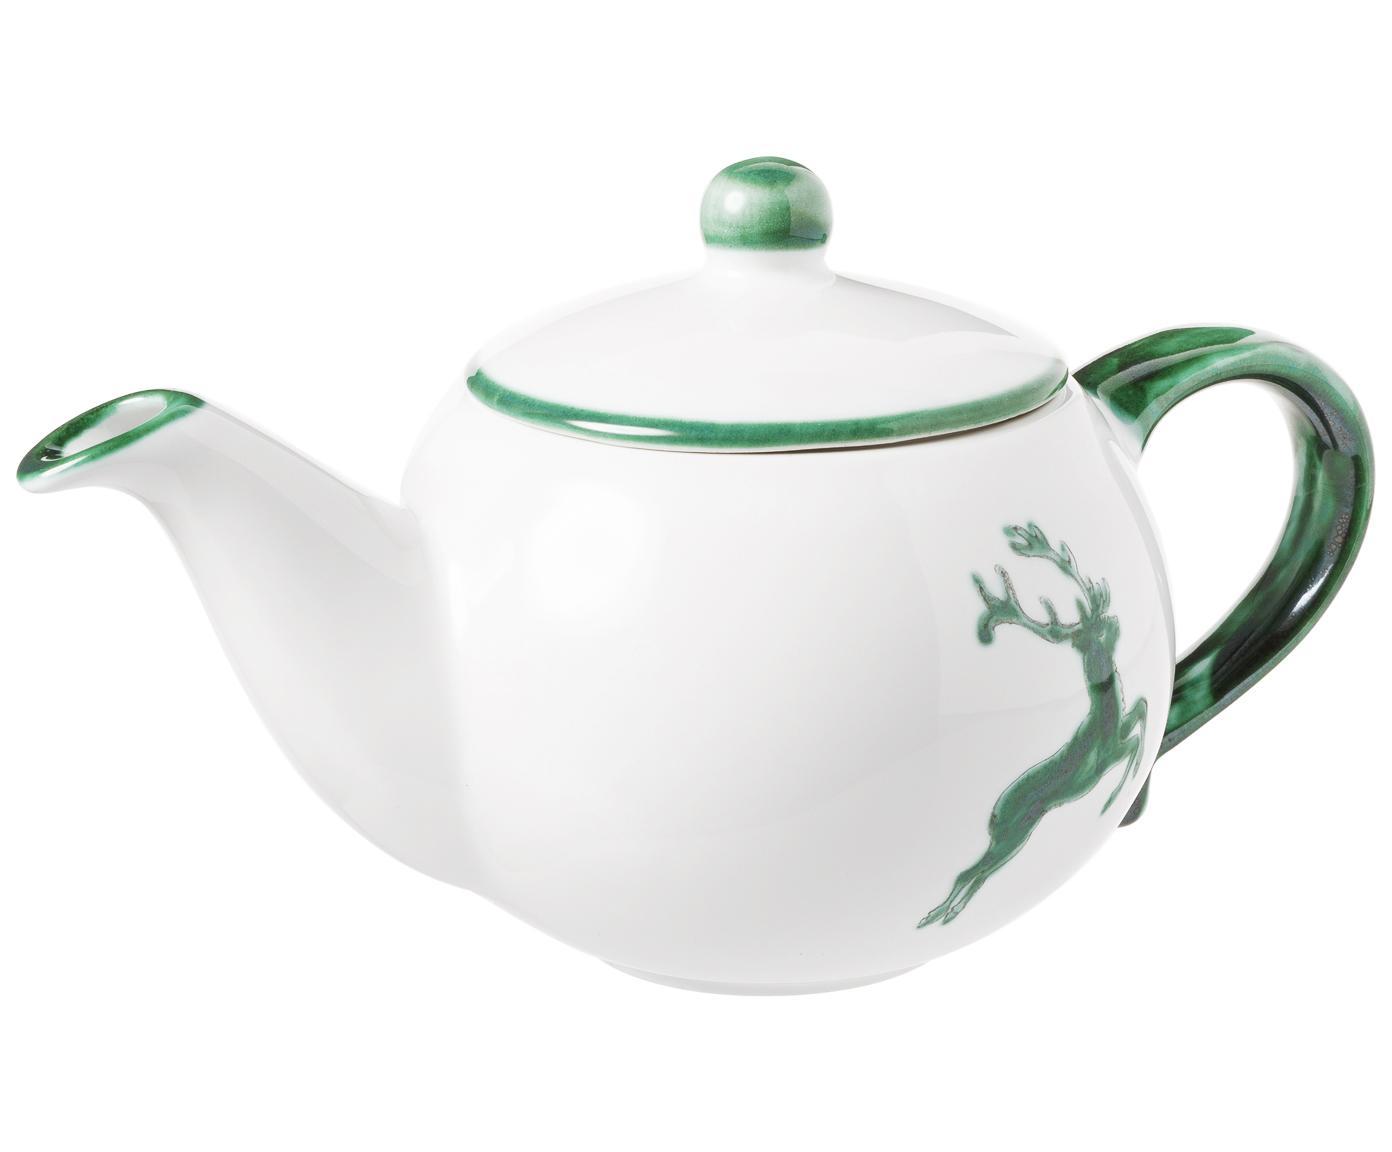 Handbemalte Teekanne Classic Grüner Hirsch, Keramik, Grün,Weiß, 500 ml